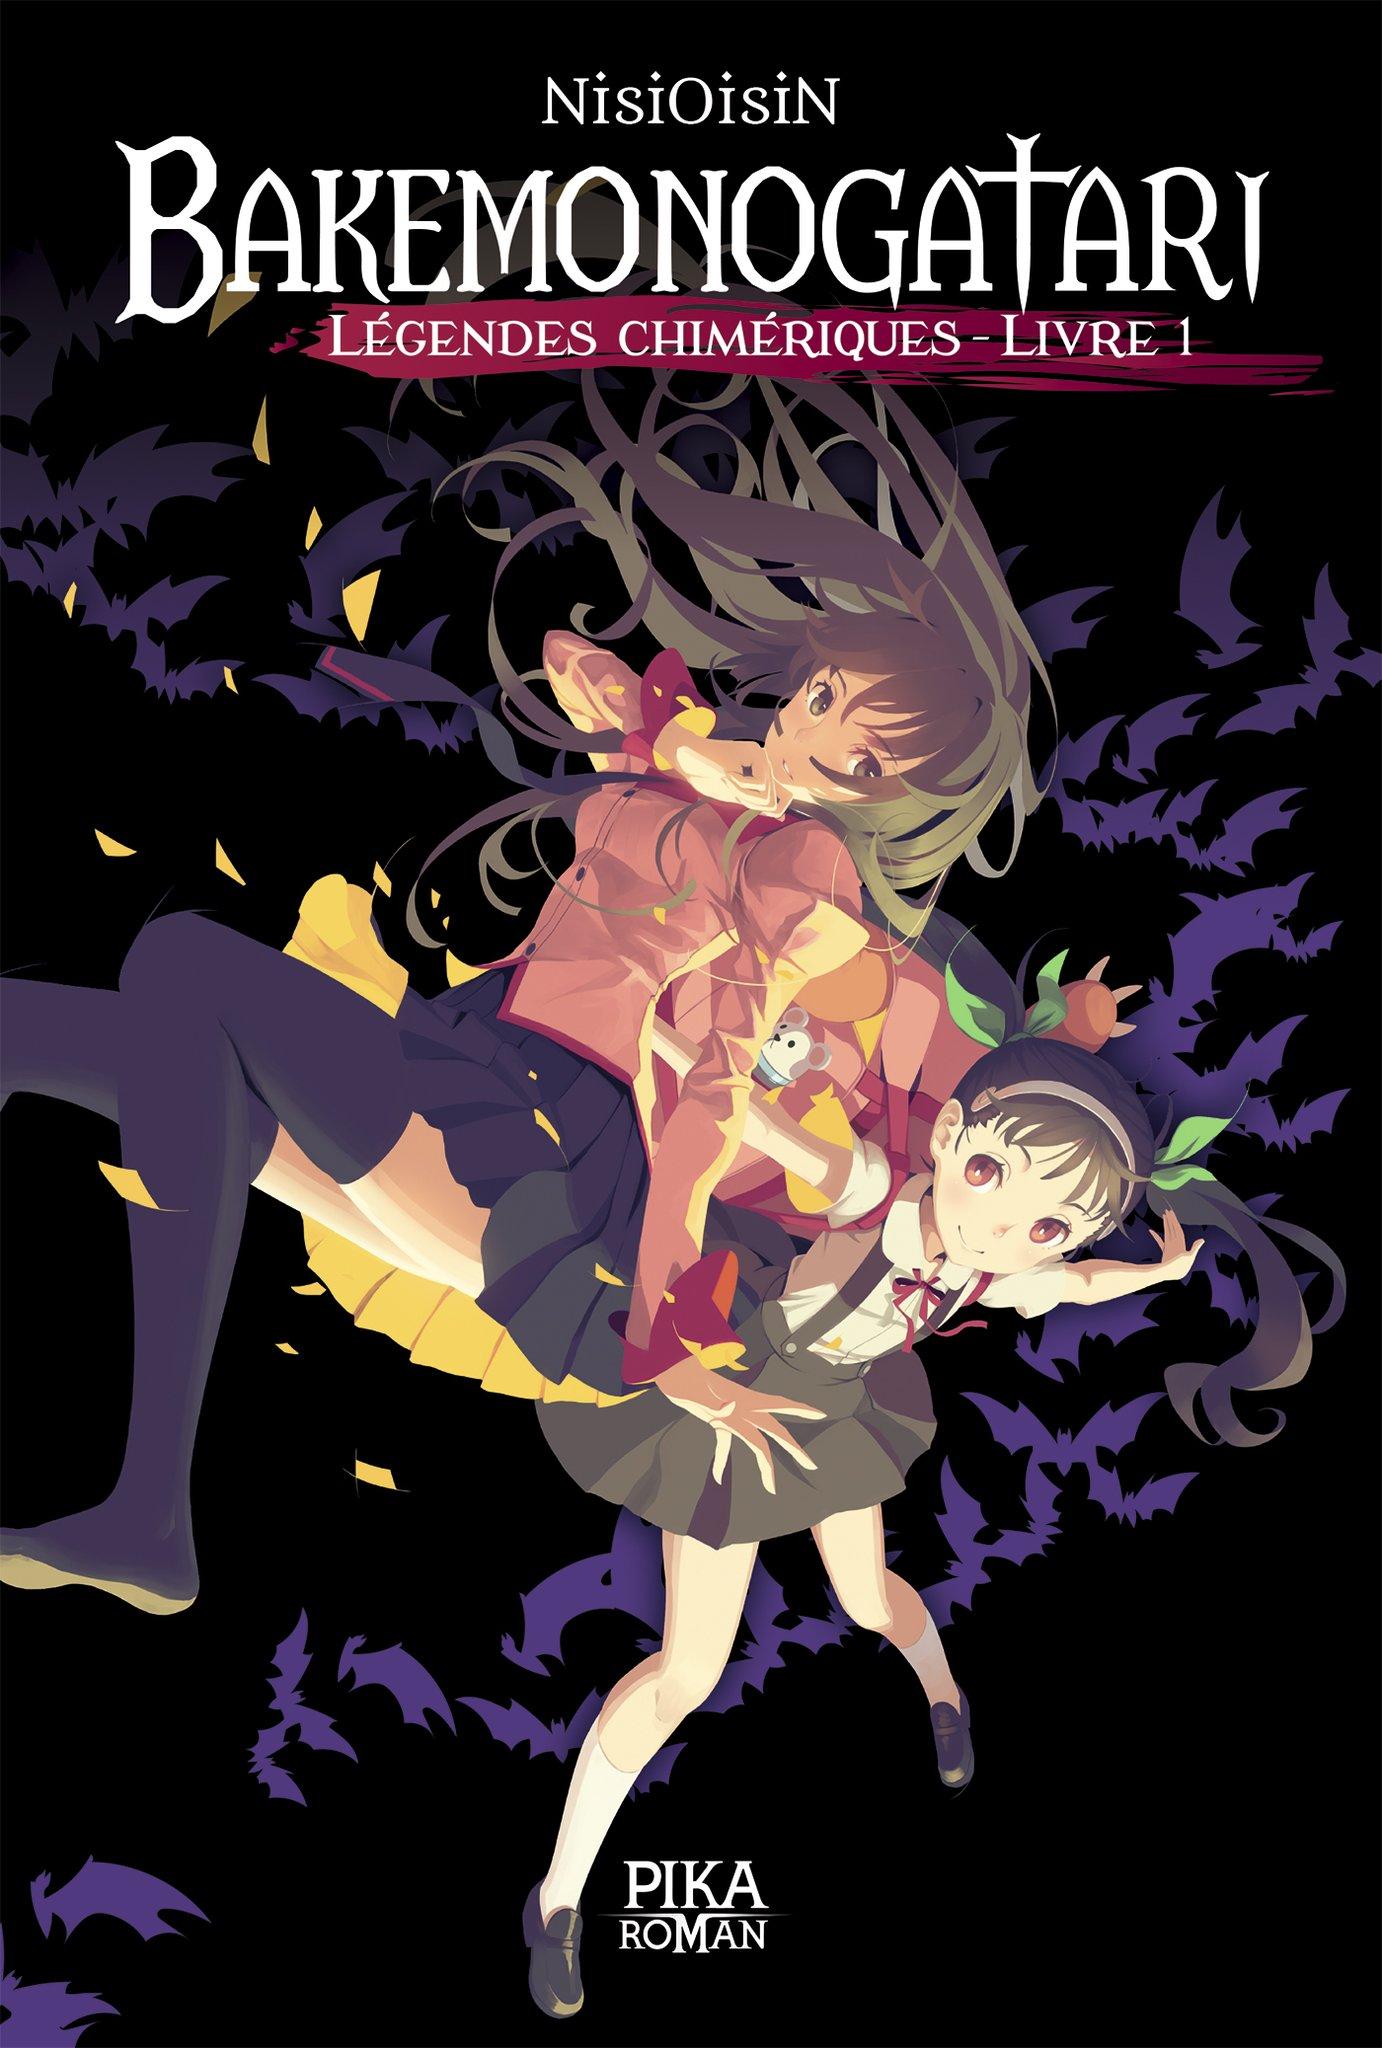 Bakemonogatari 1 - Livre 1